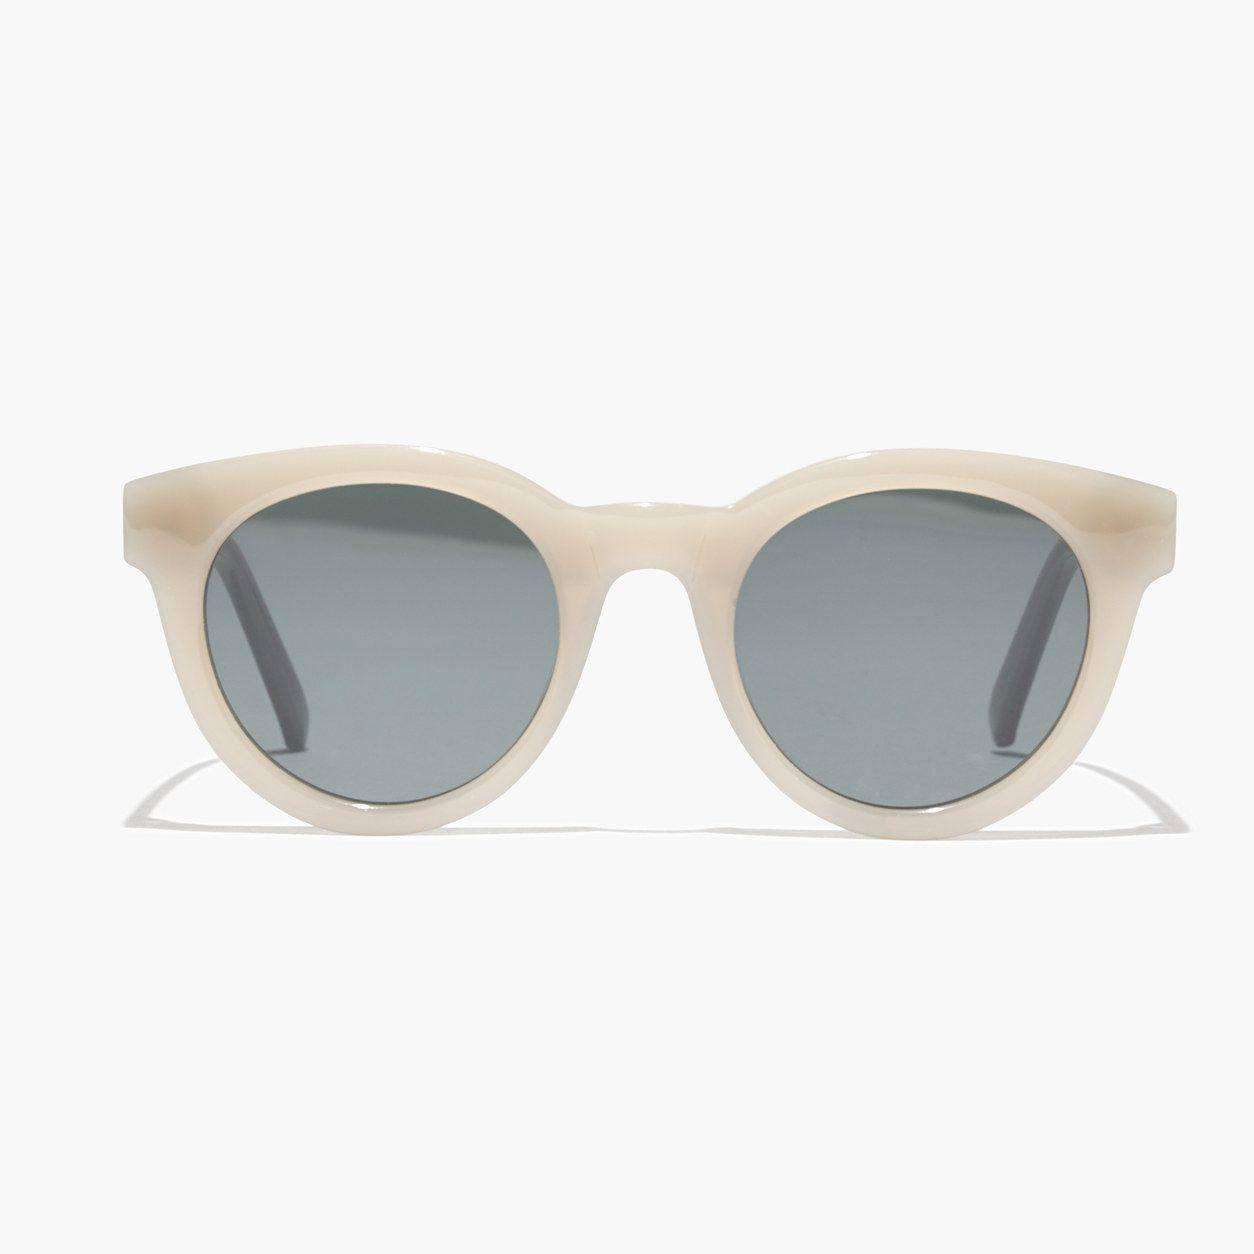 0ccae84d4382c Madewell Halliday Sunglasses